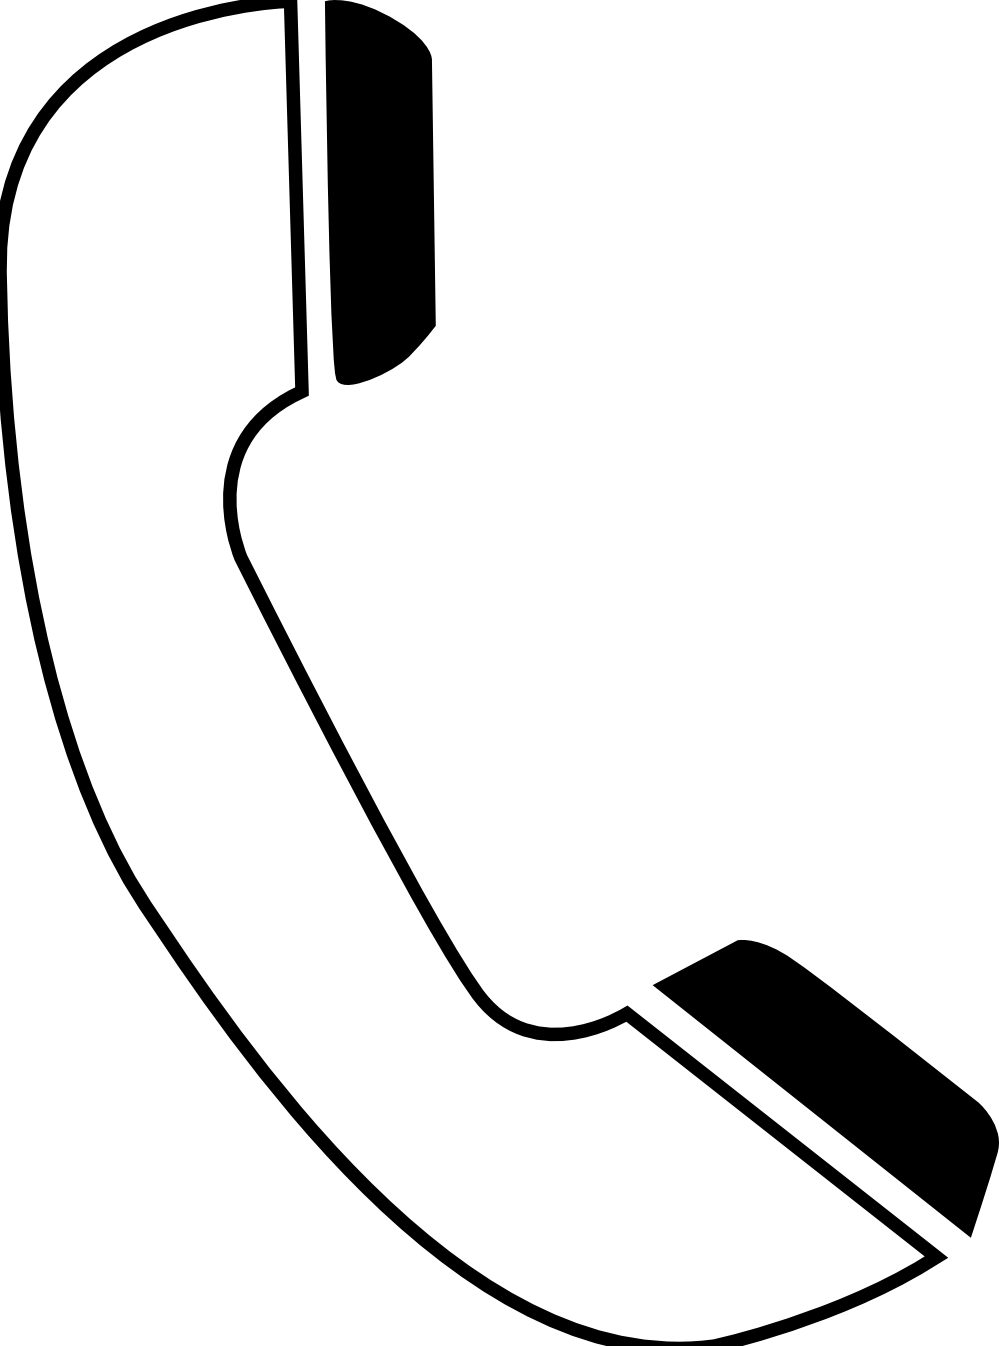 Telefono Telephone Phone Icon Black White Line Art ...